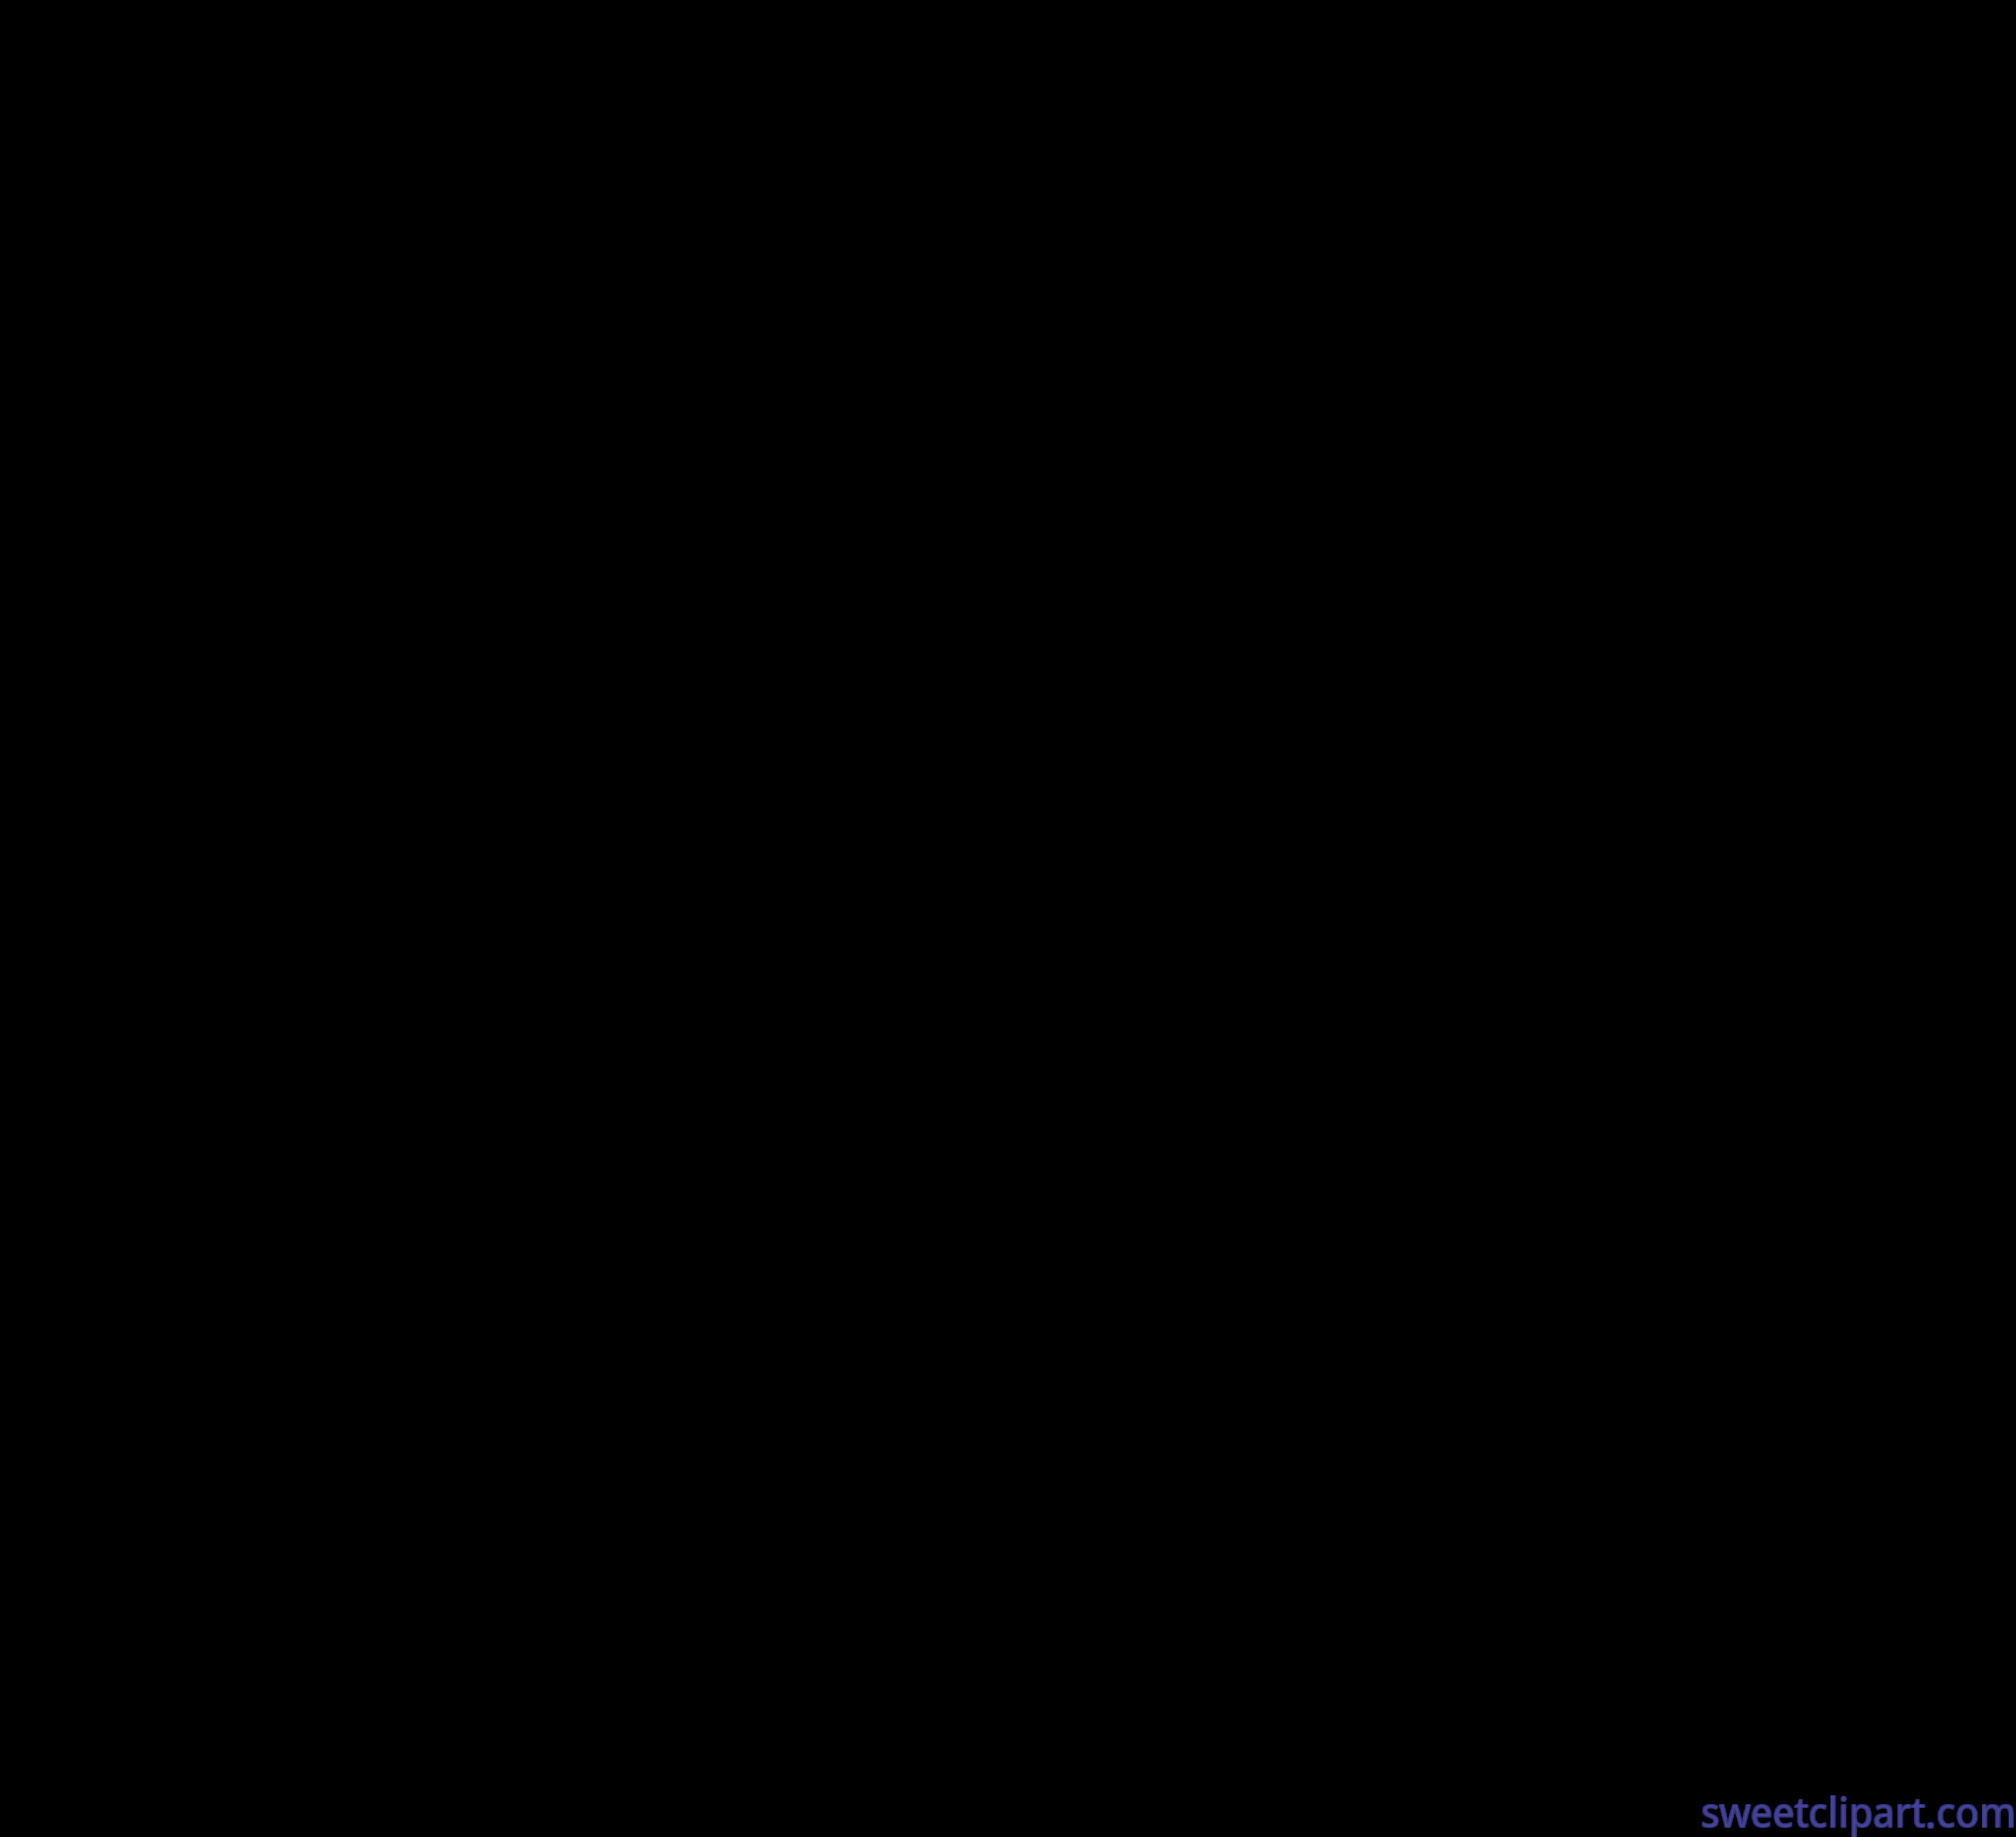 Fireworks Black Silhouette Clip Art